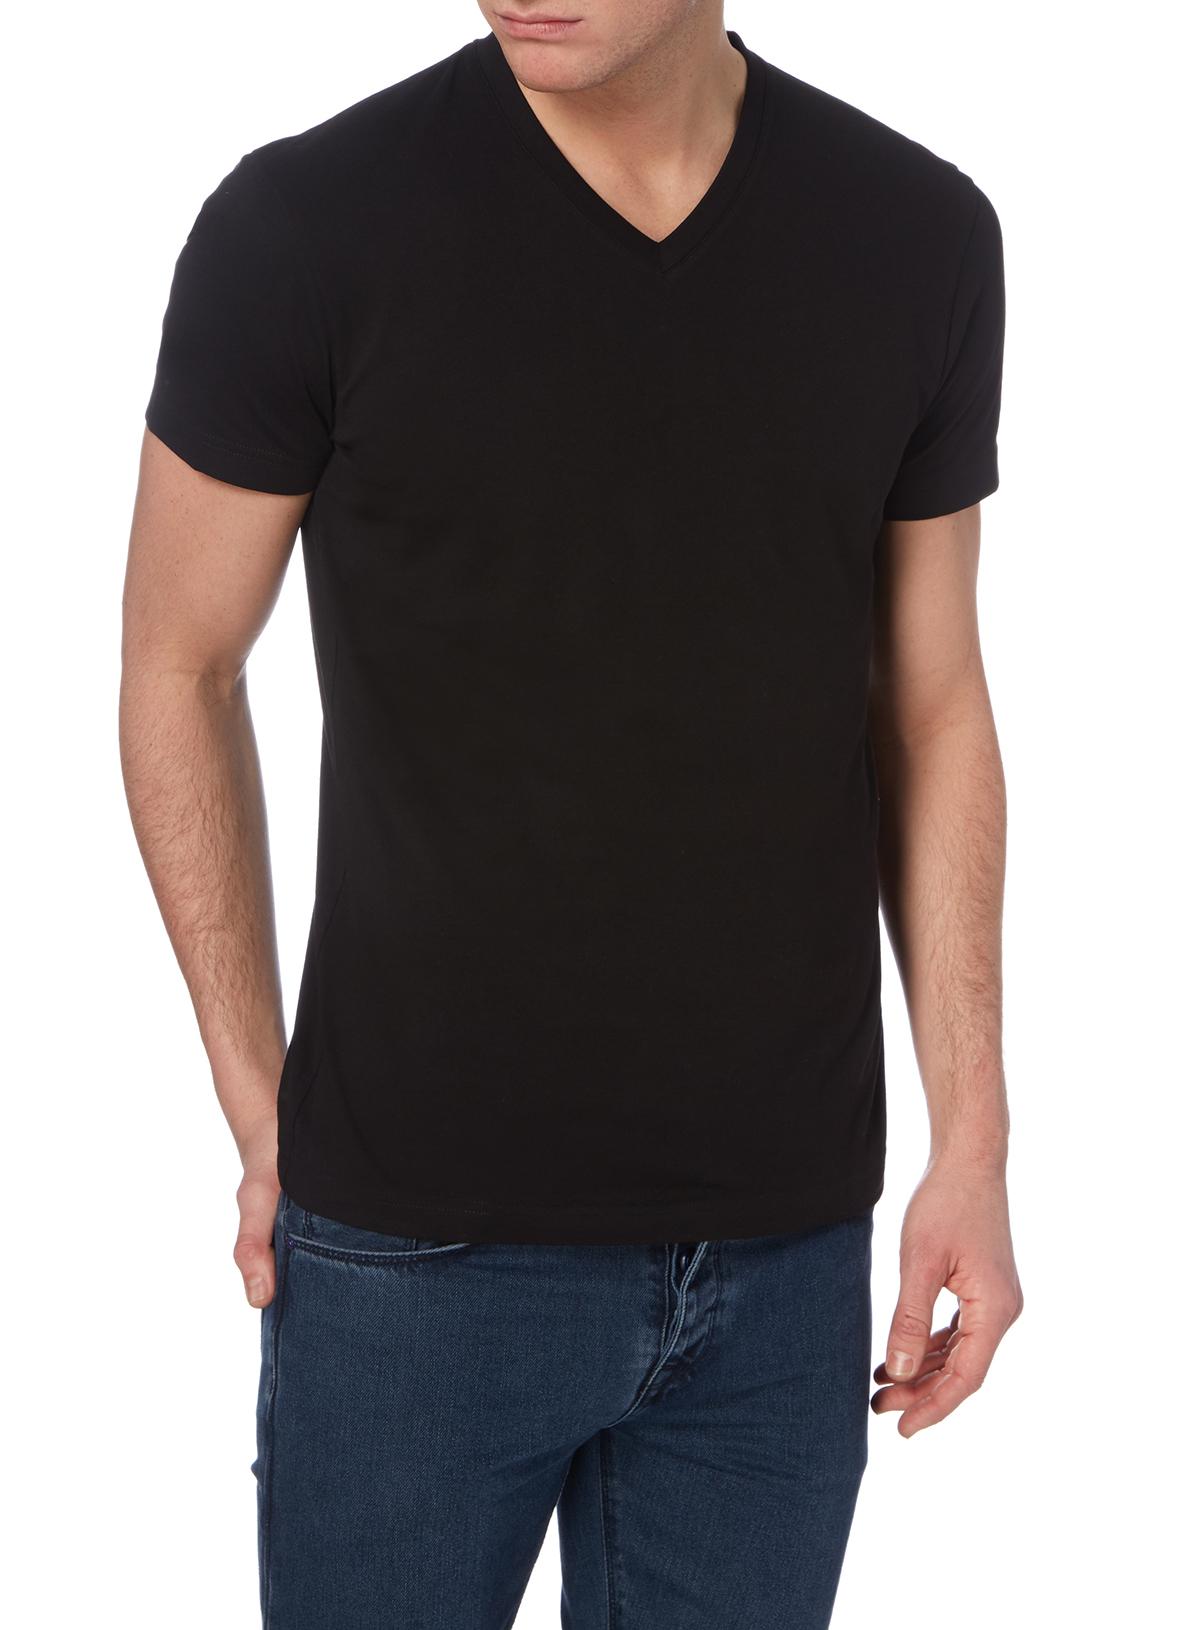 Black t shirts v neck - Black V Neck T Shirt